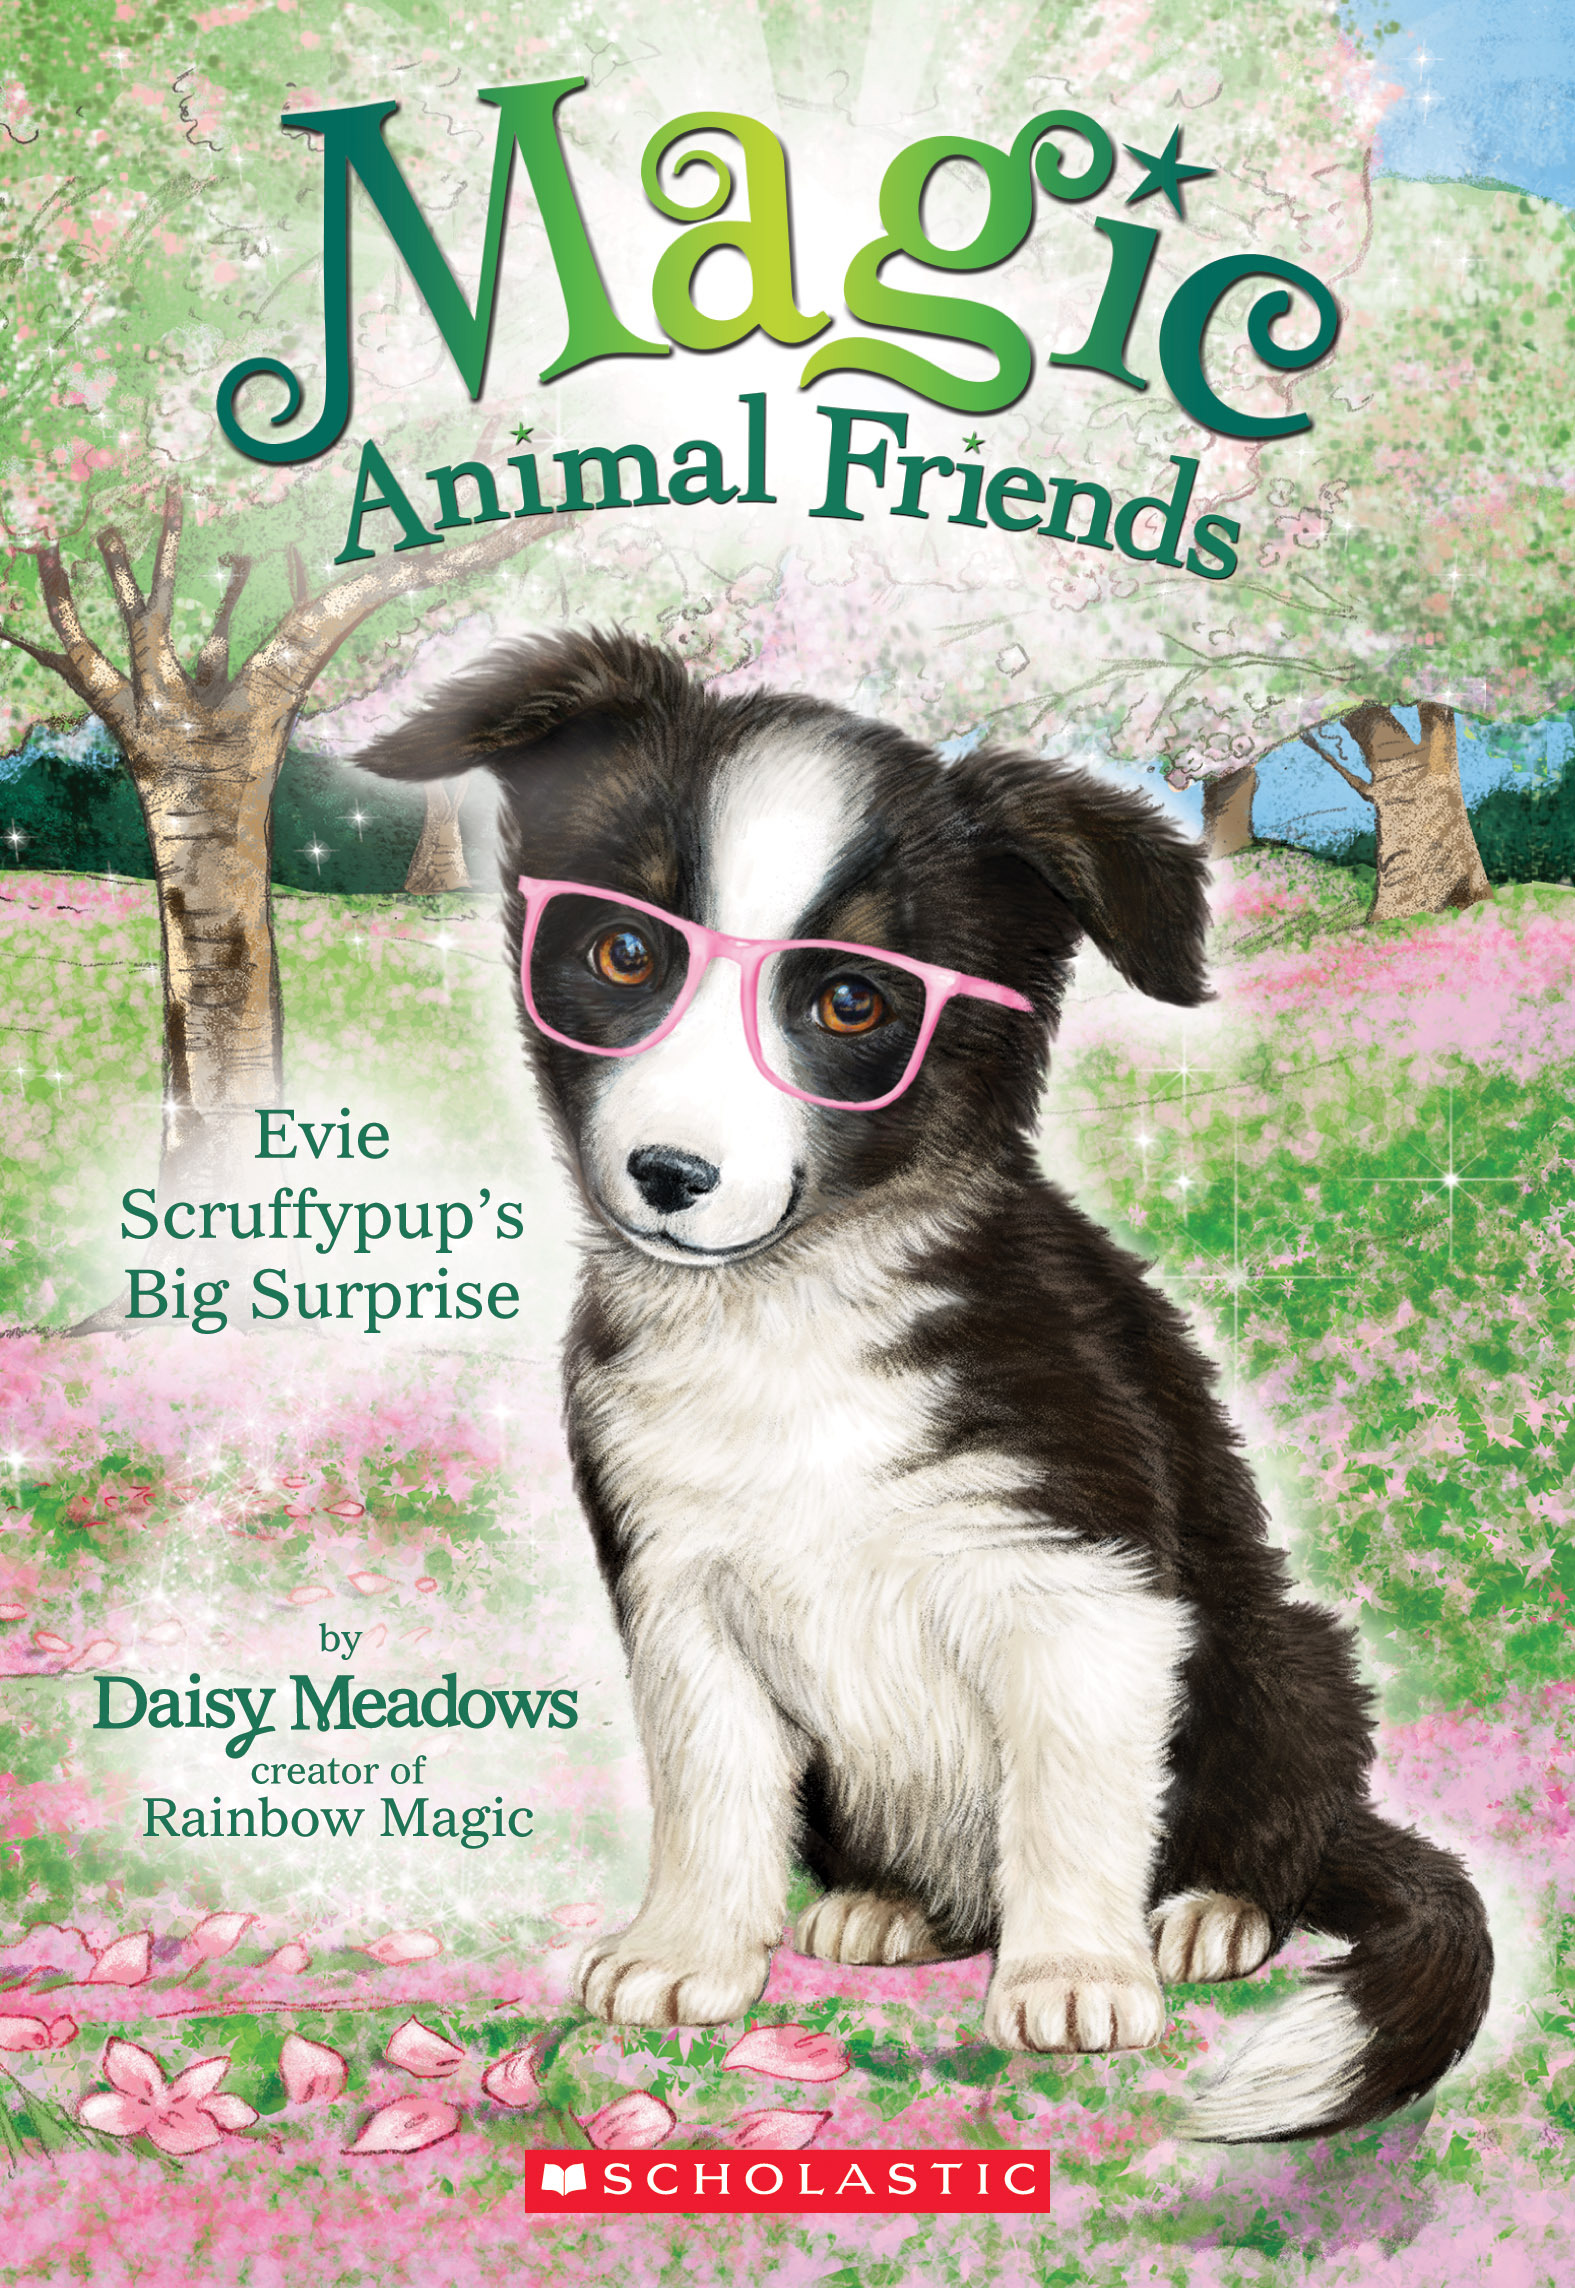 Evie Scruffypups Big Surprise (Magic Animal Friends #10) Daisy Meadows